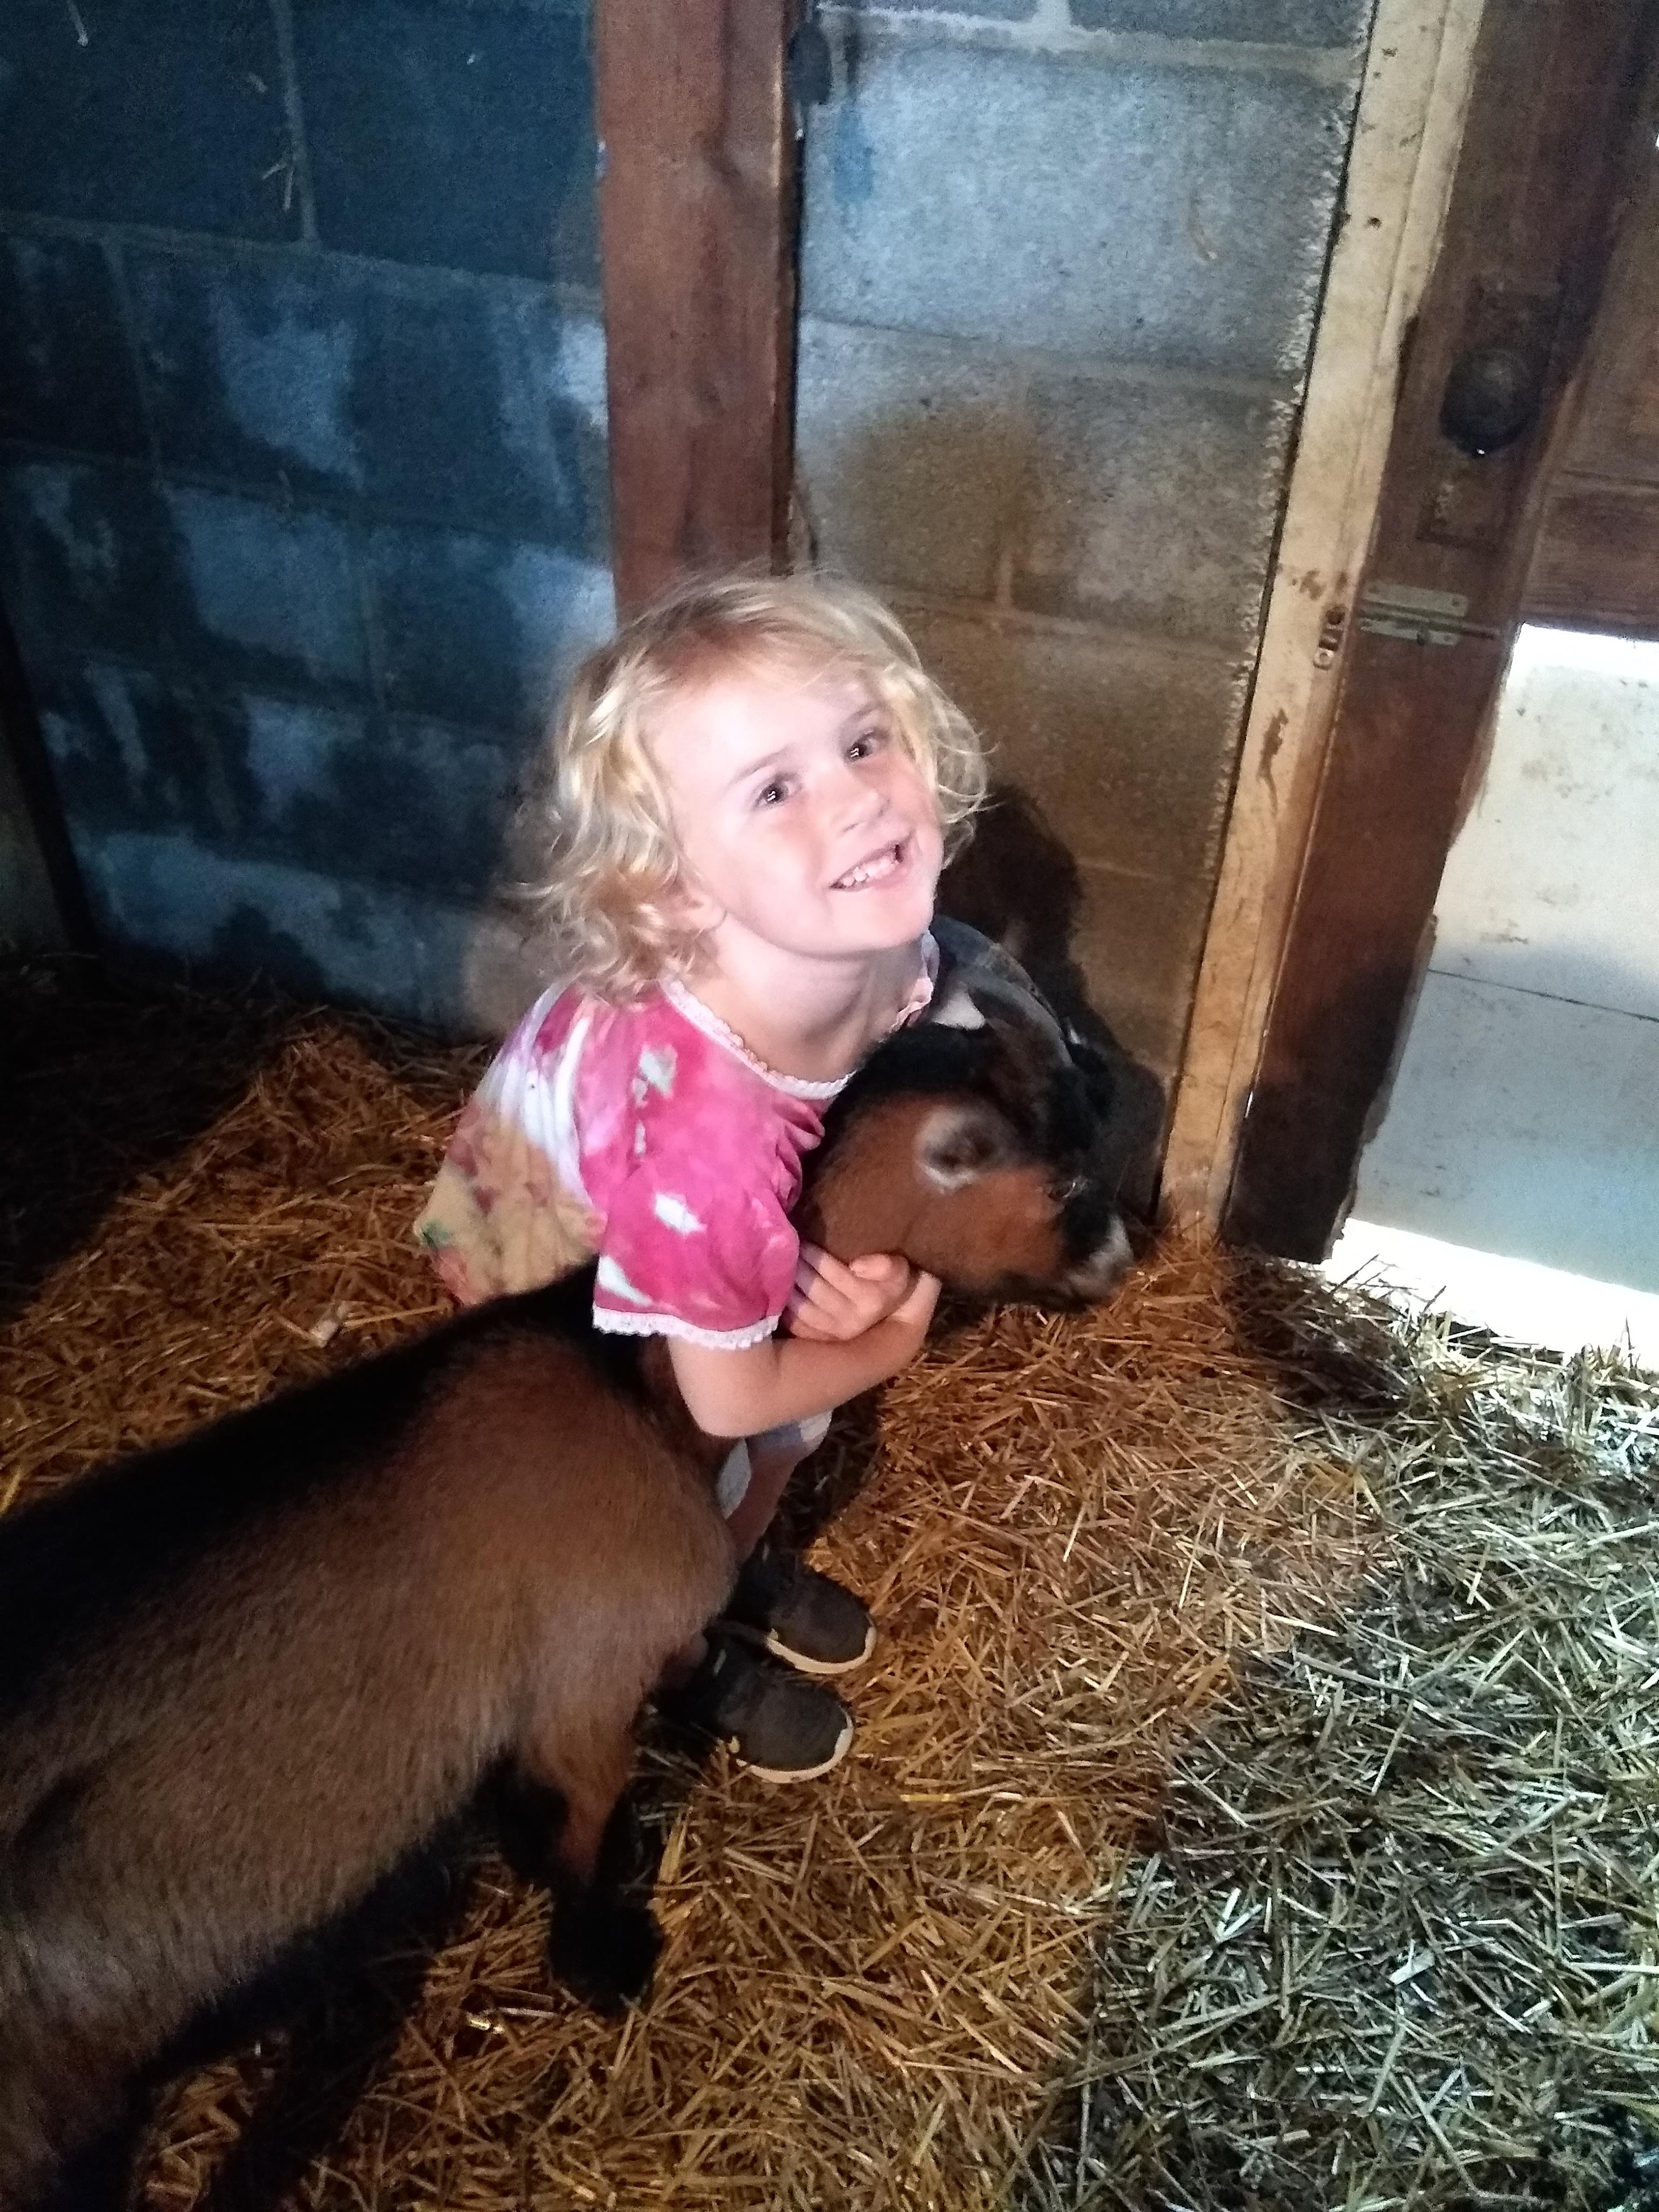 Next Happening: Farm Happenings for October 11, 2019